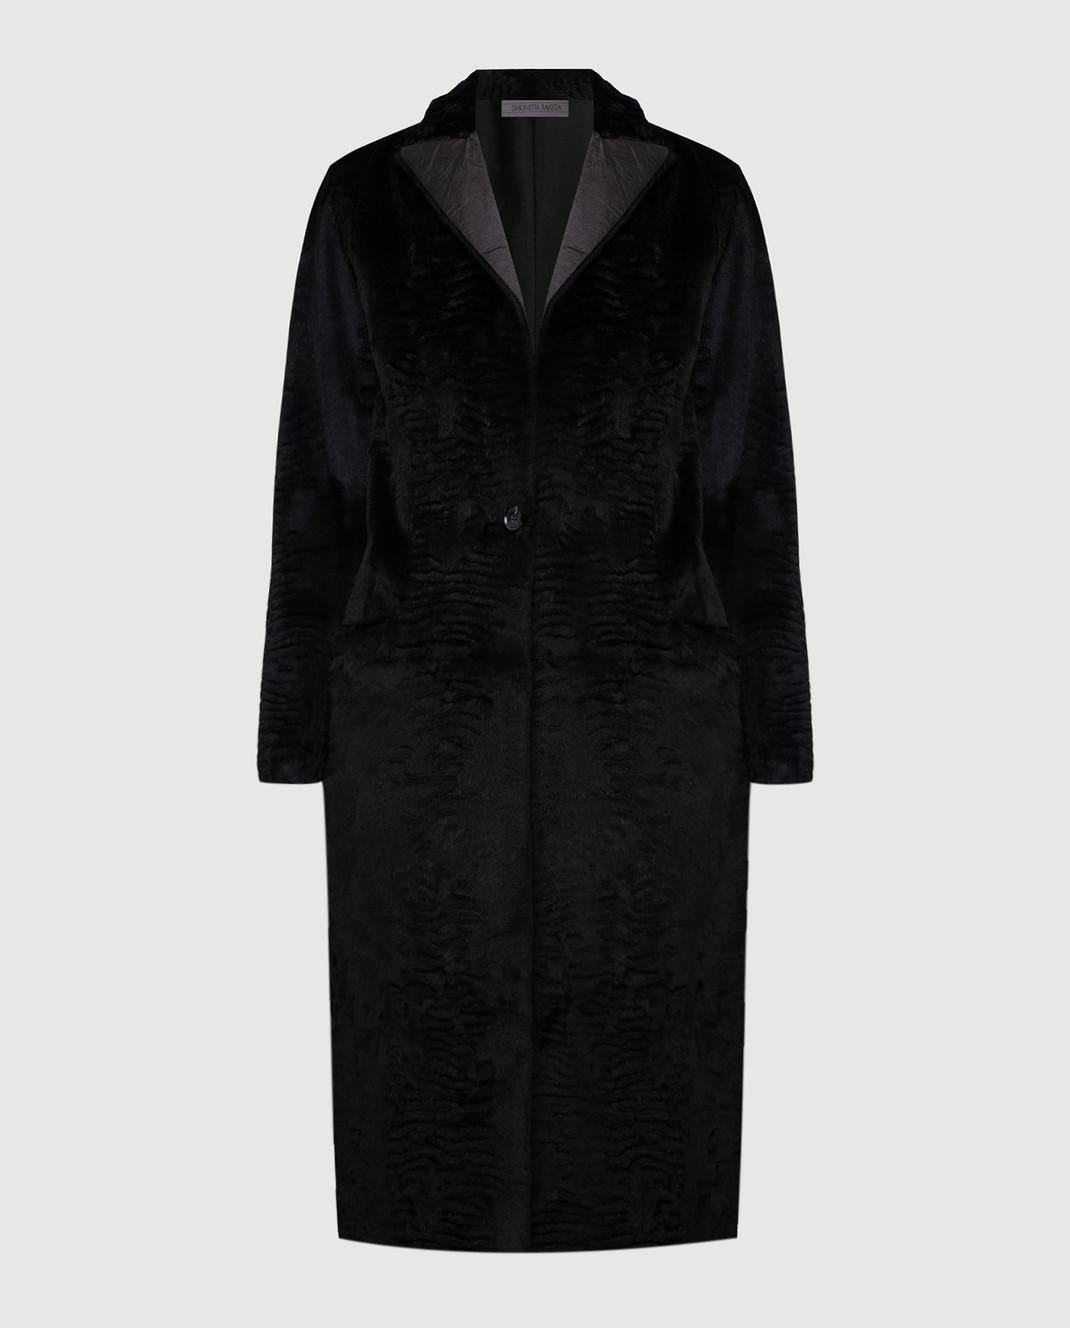 Simonetta Ravizza Черное пальто из кролика GCAPG